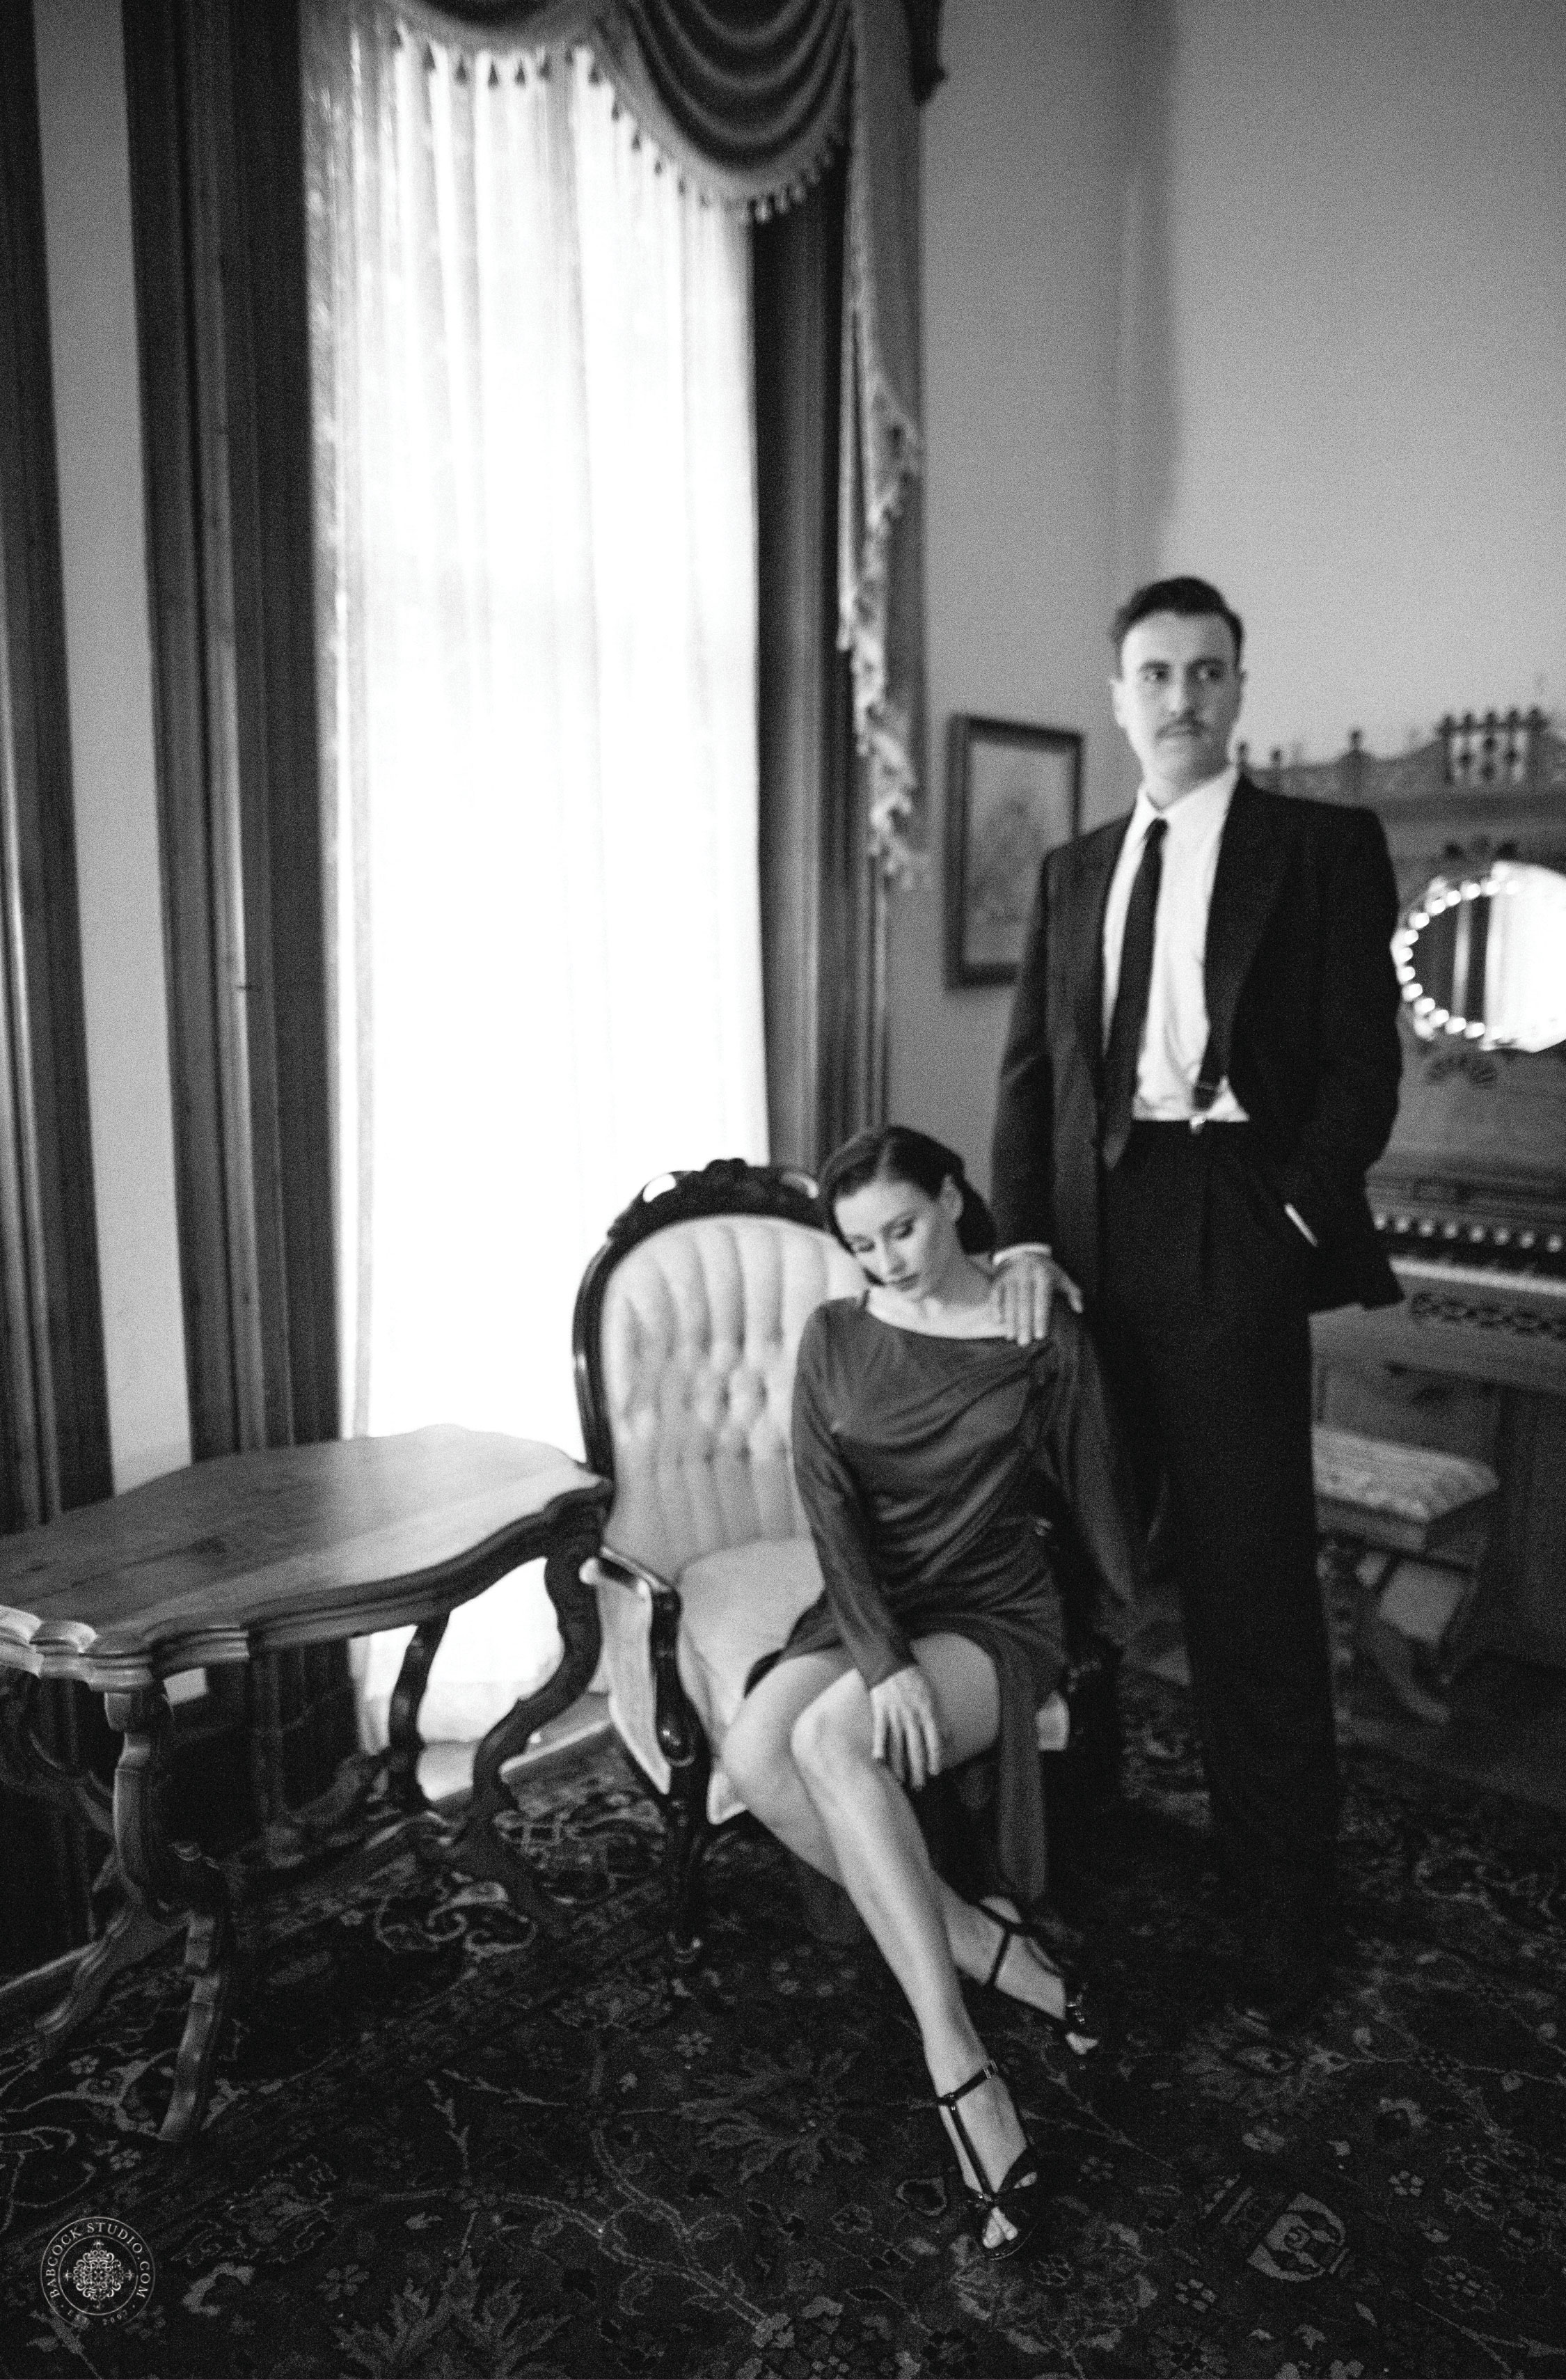 chris-eden-vintage-styled-photographer-dayton-ohio-4.jpg